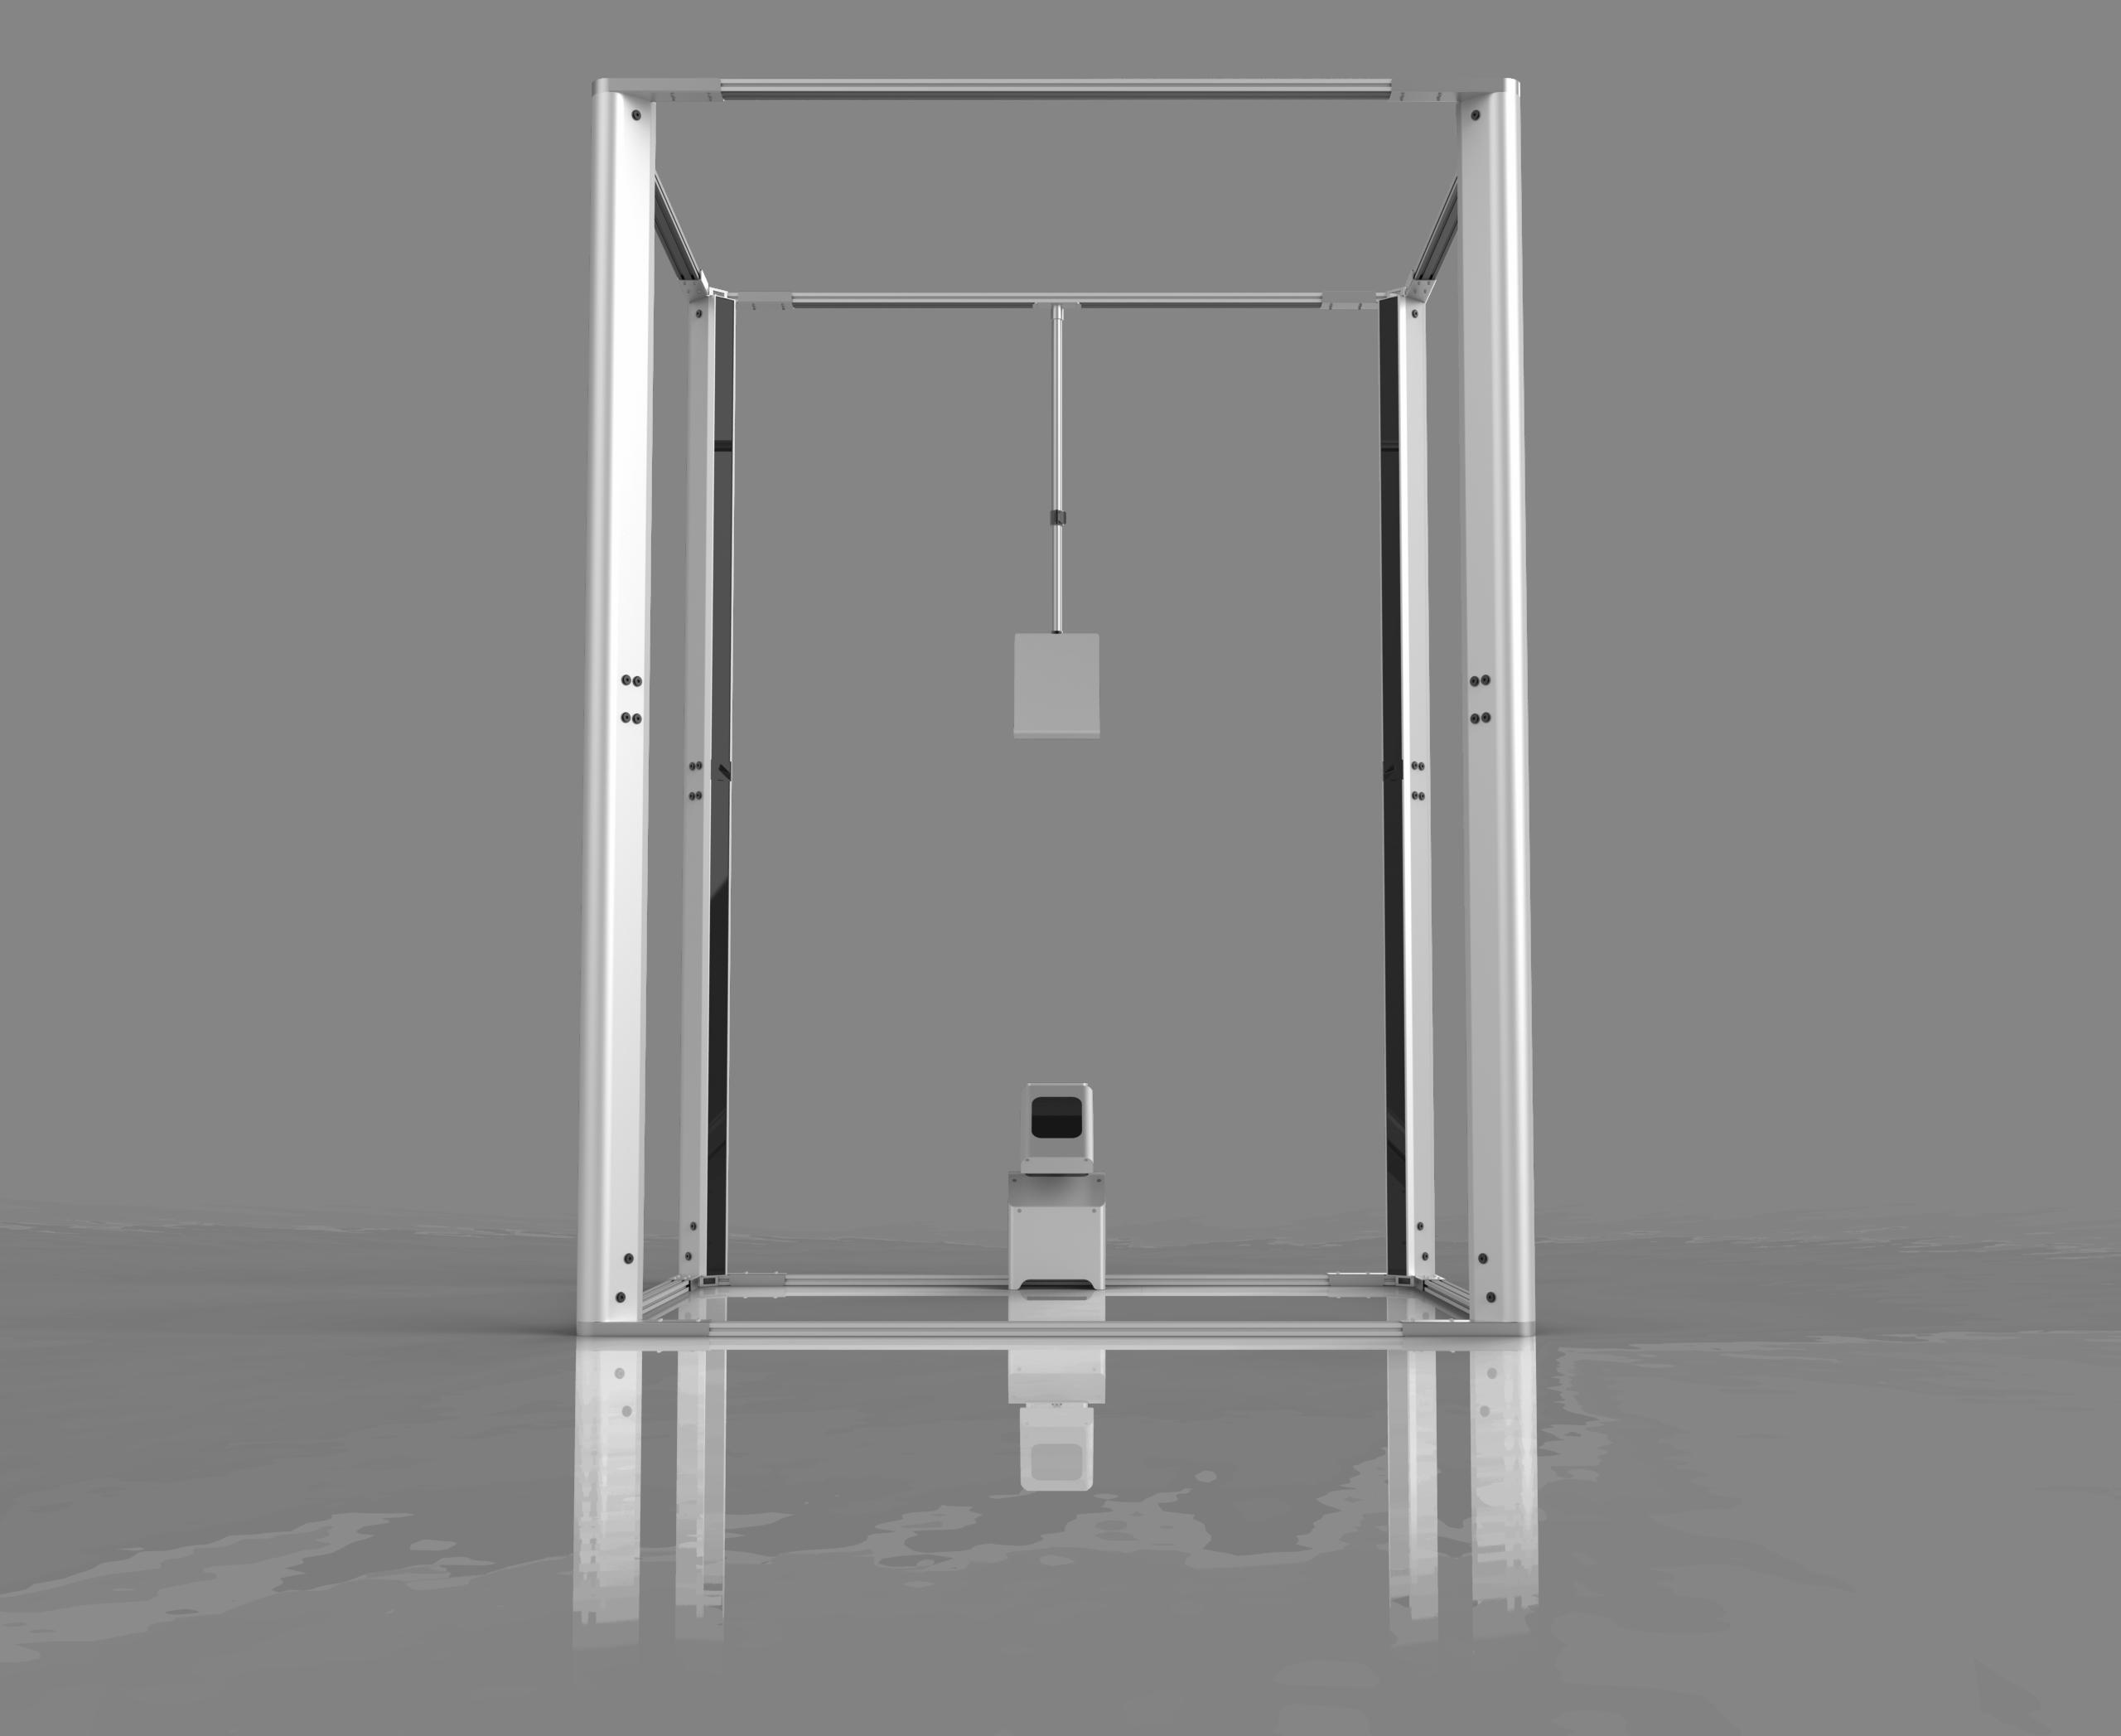 TG3D Studio Scanatic 360 Body Scanner